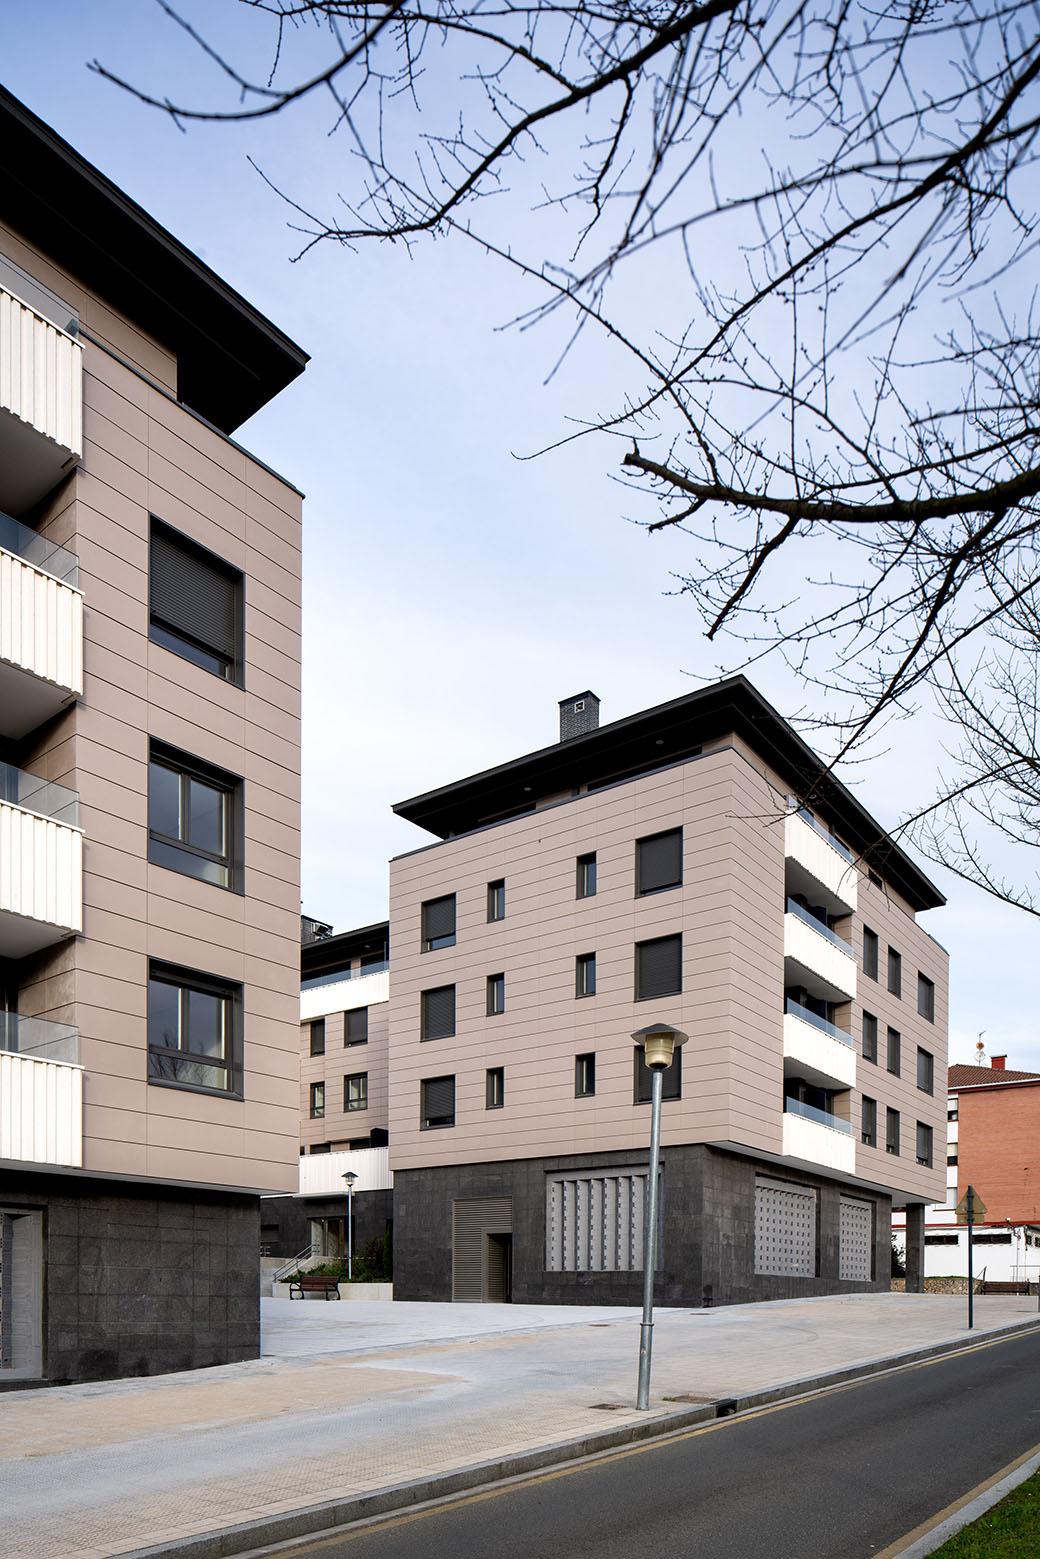 Fotógrafo de Arquitectura - Bloque de viviendas